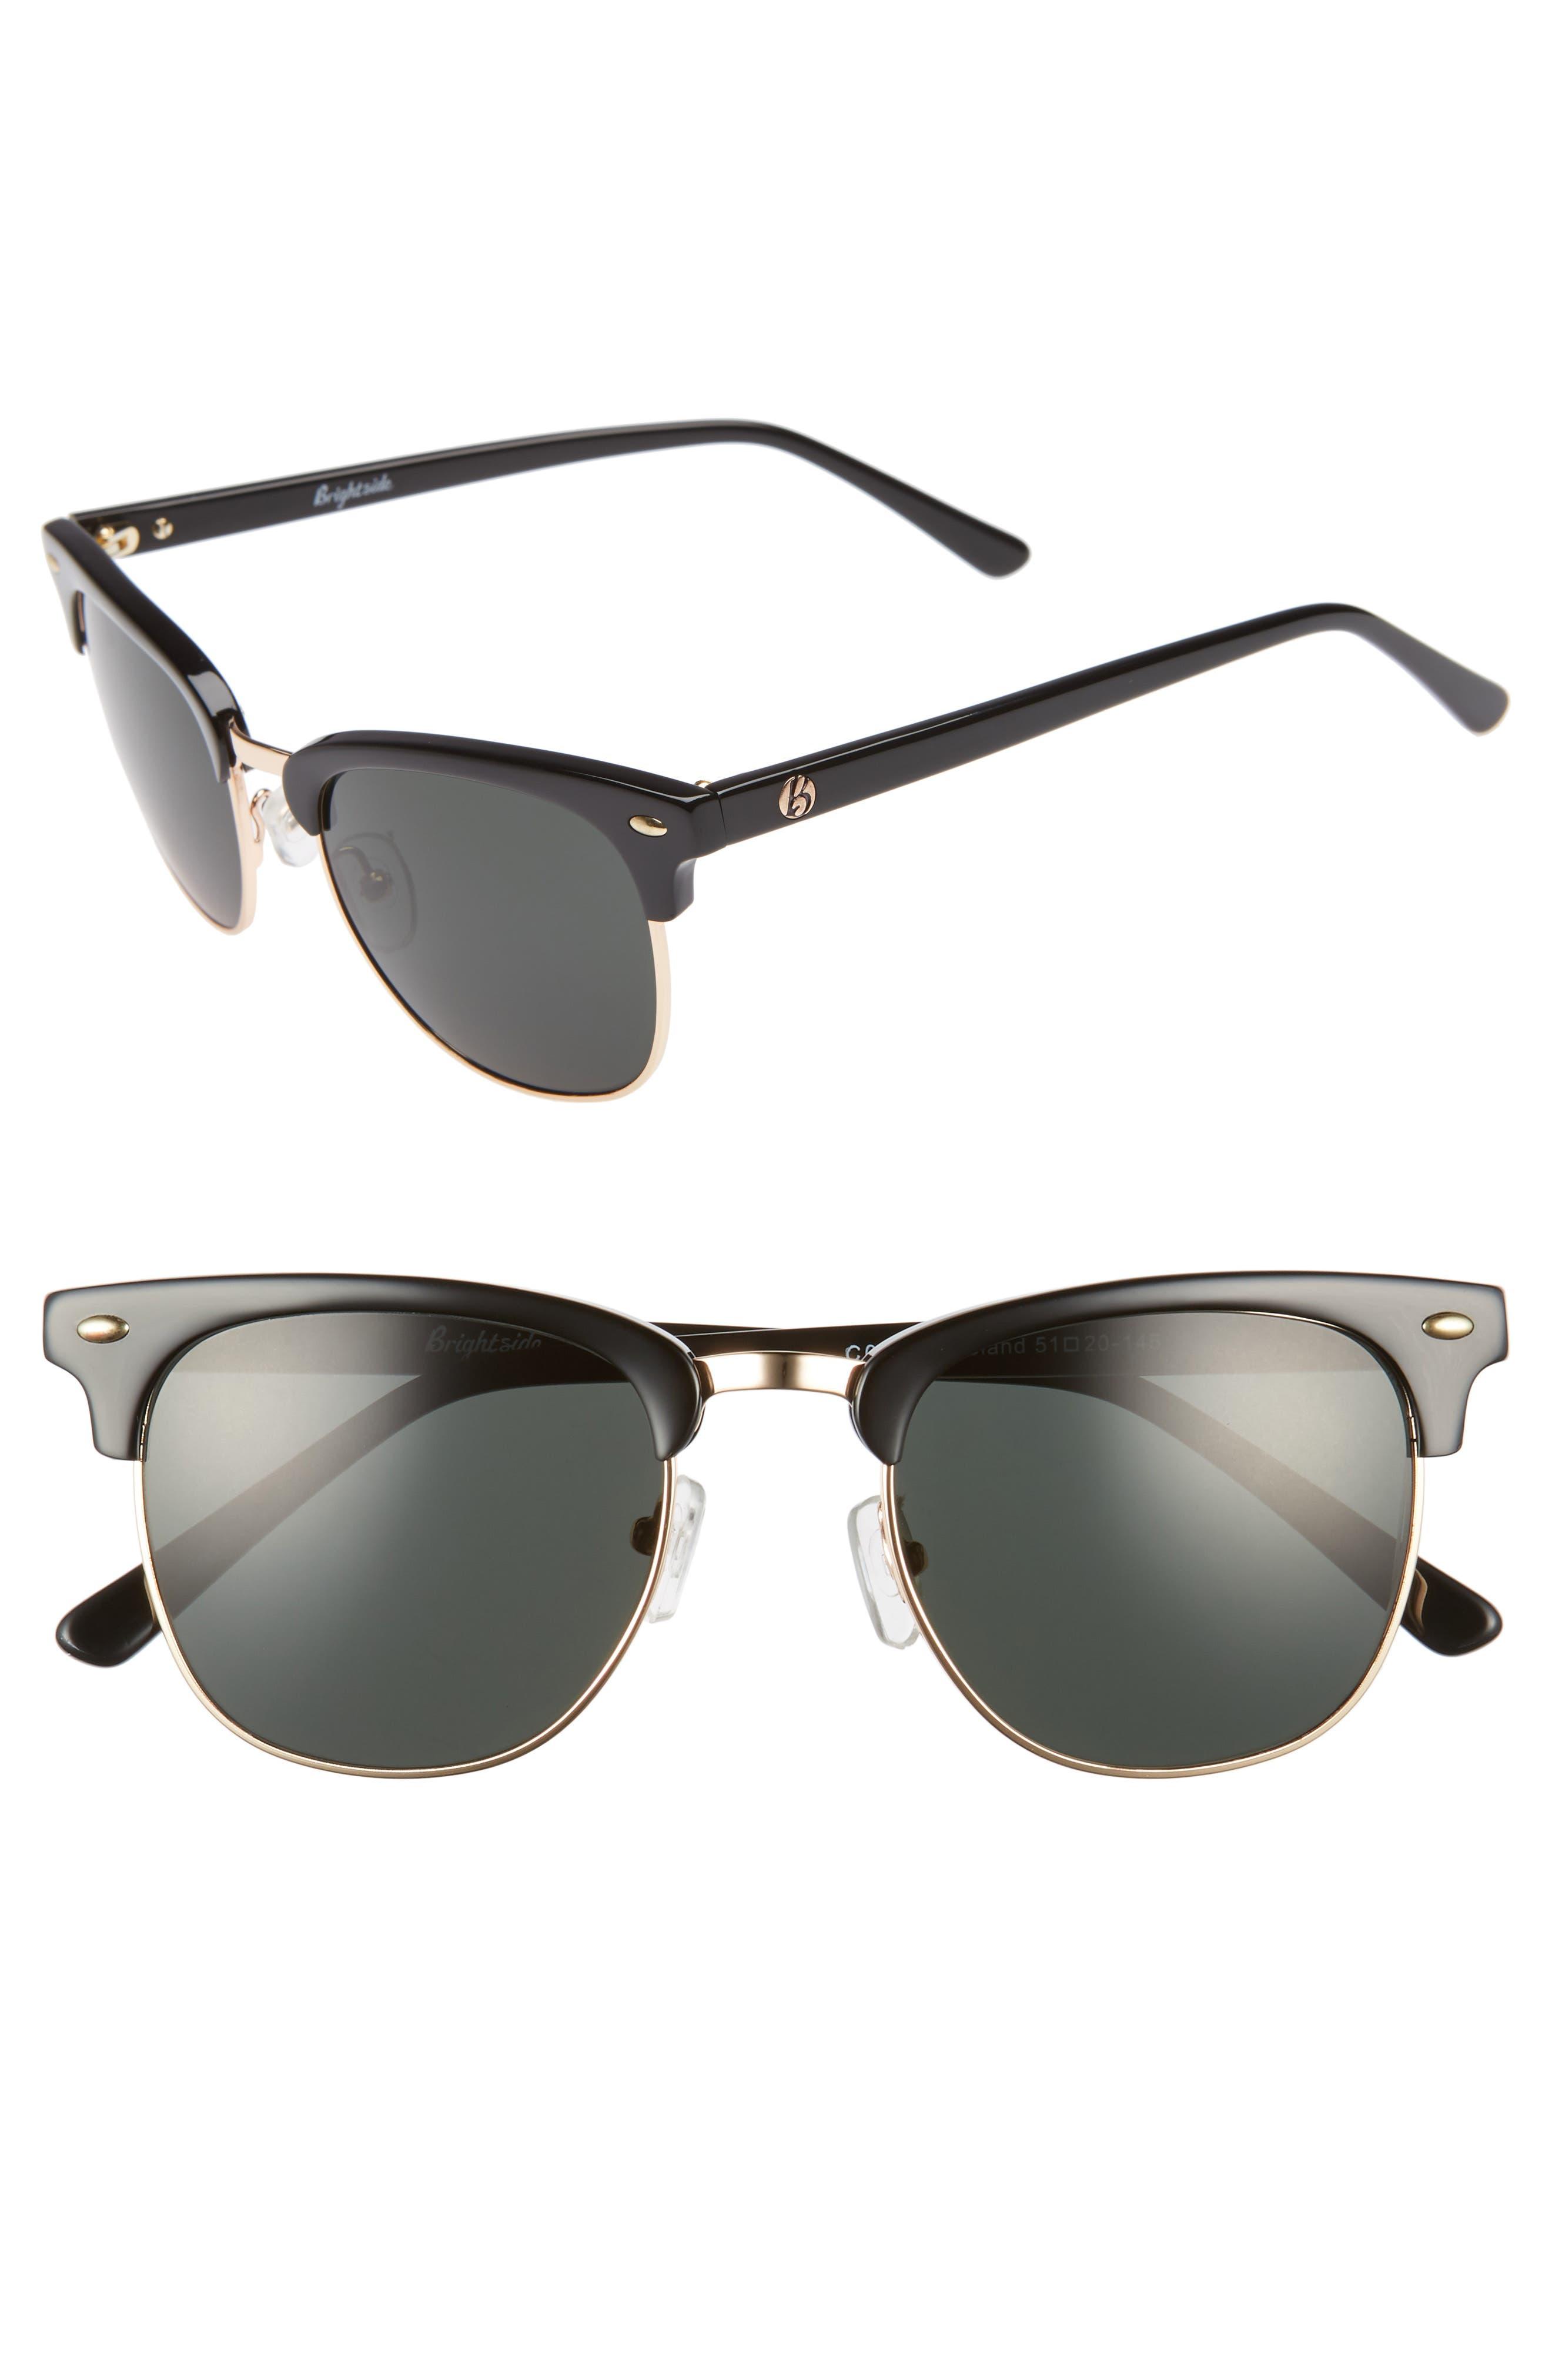 Copeland 51mm Sunglasses,                         Main,                         color, BLACK/ GREY